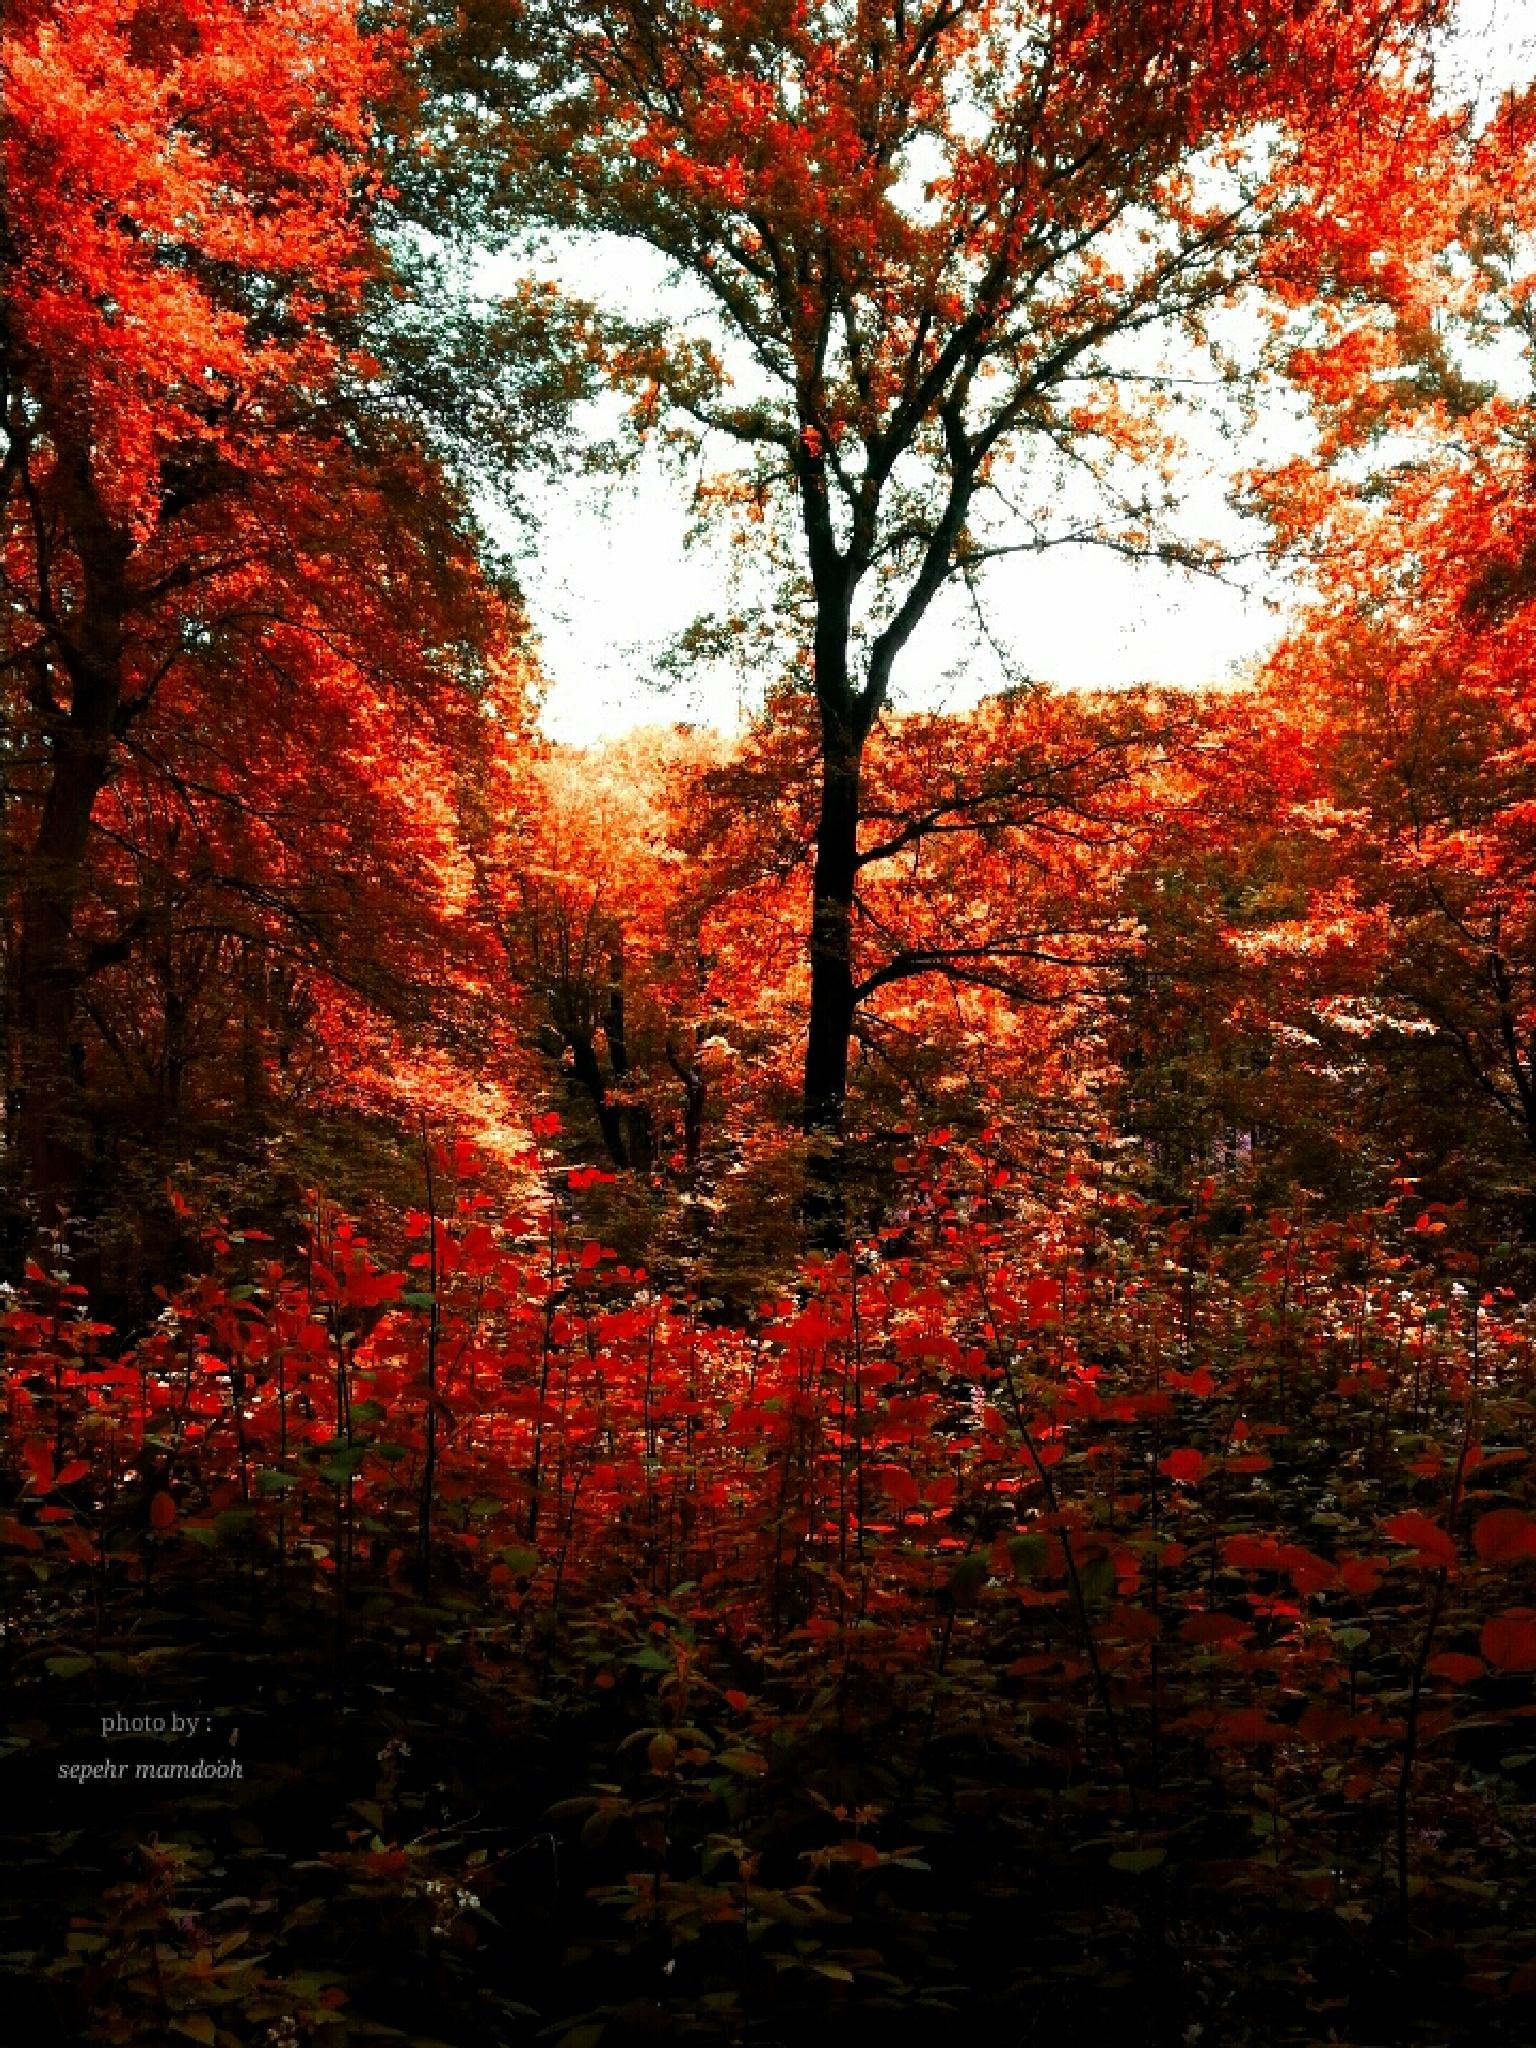 jangel in fall by sepehr.mamdooh